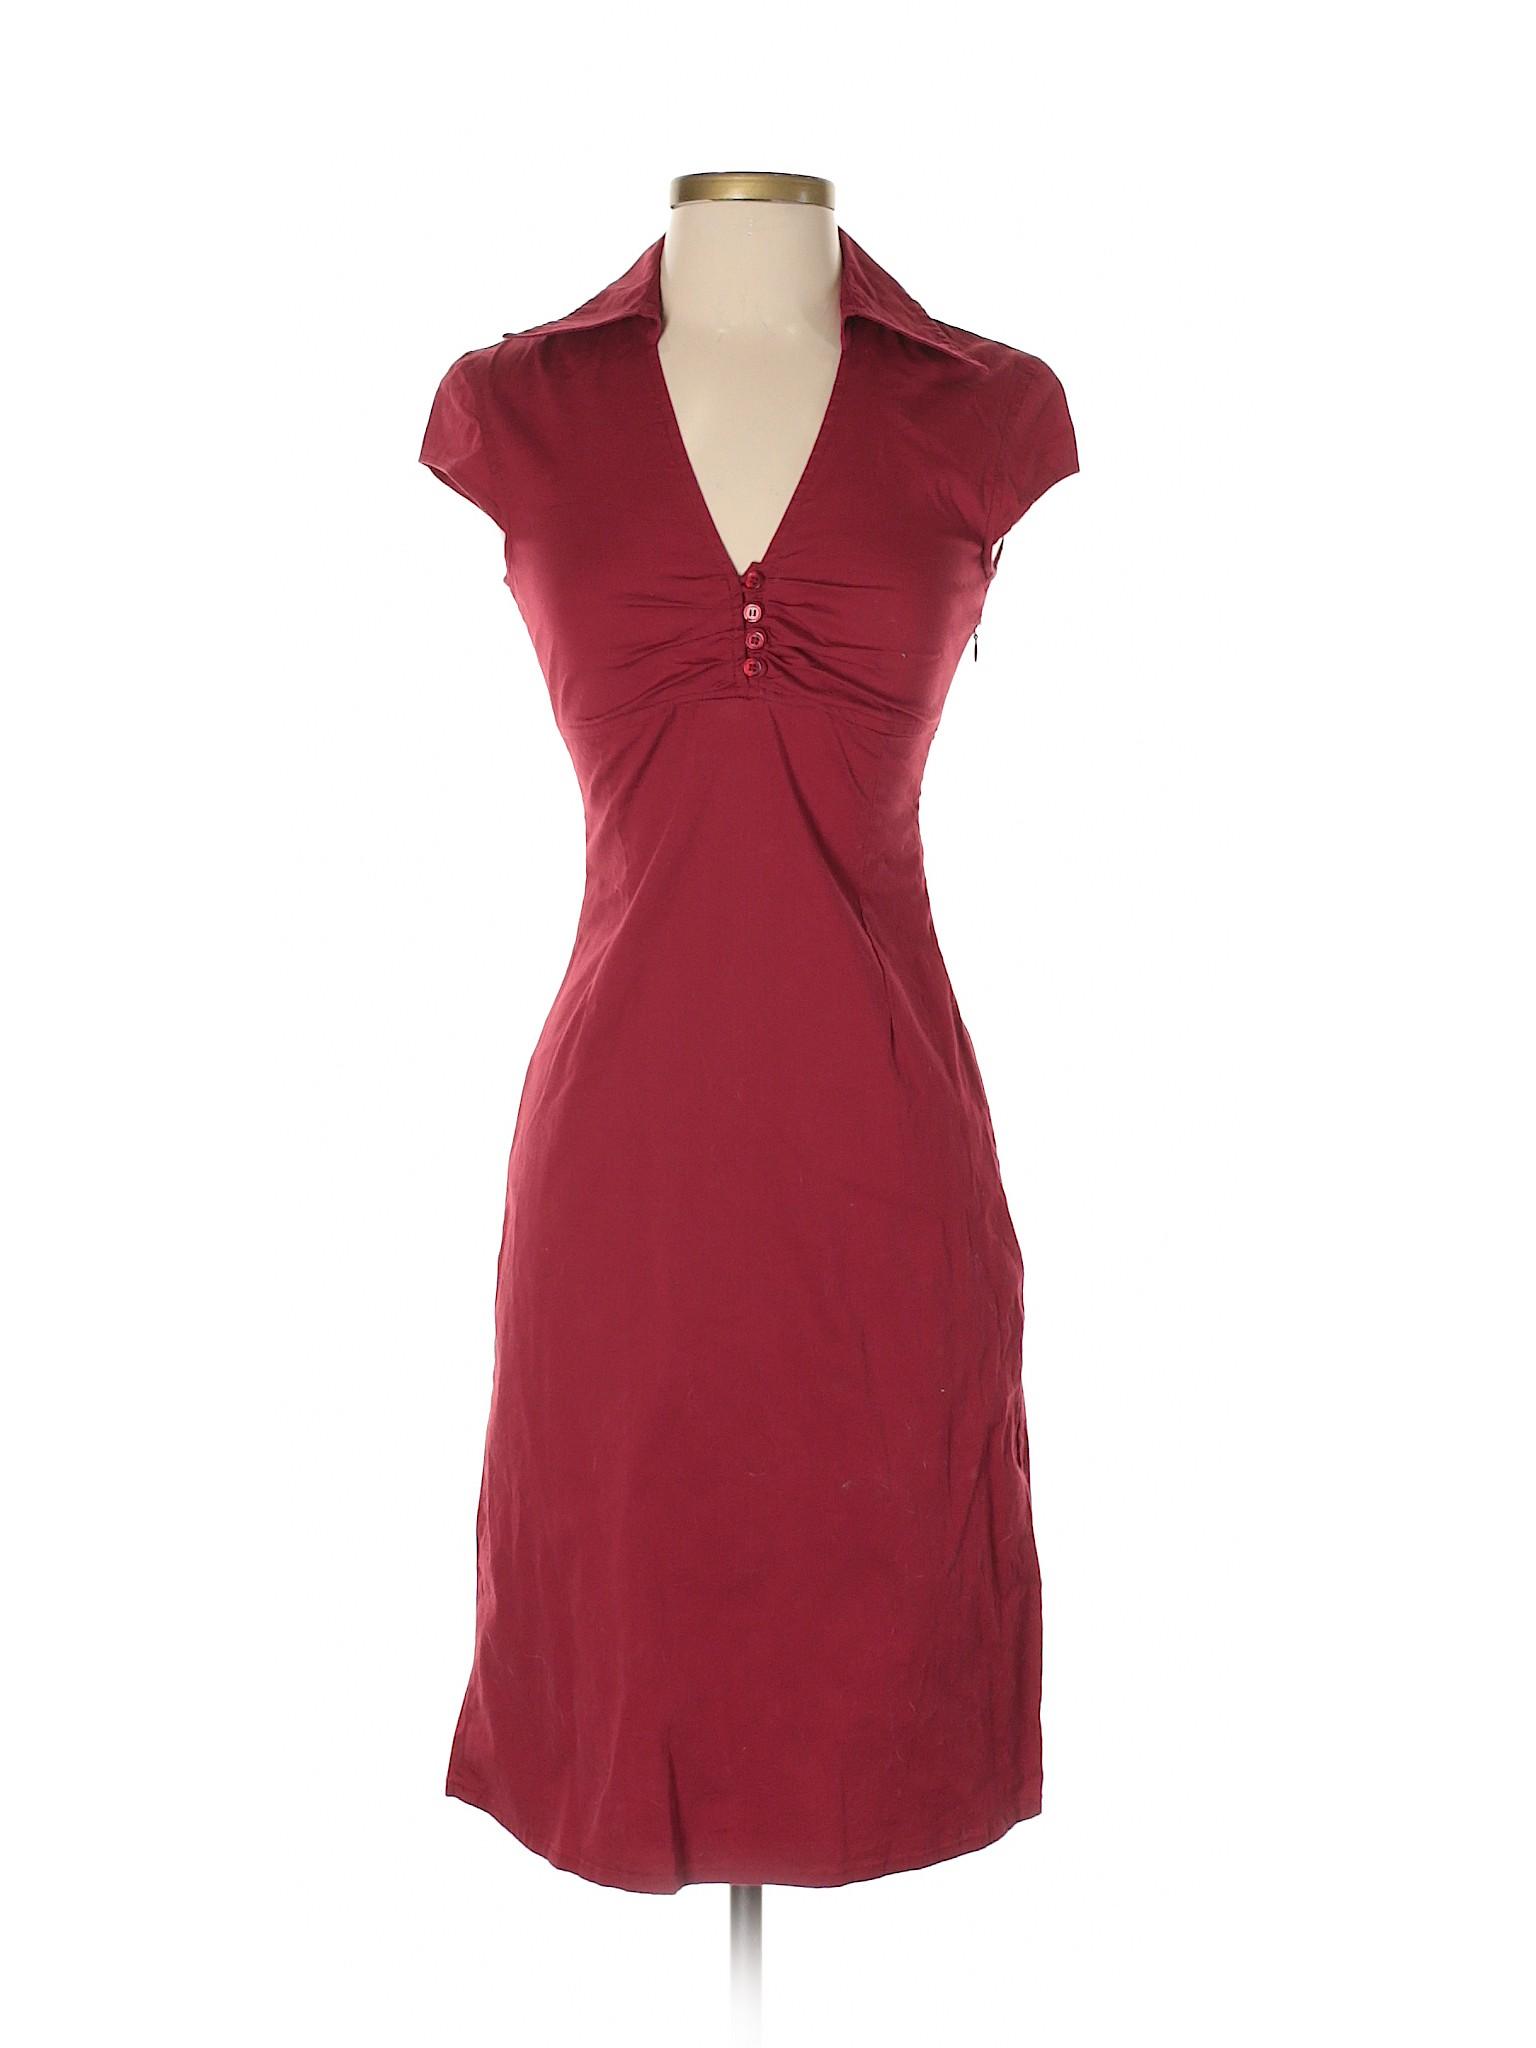 Boutique amp;M Casual H Dress winter qA4gqxH